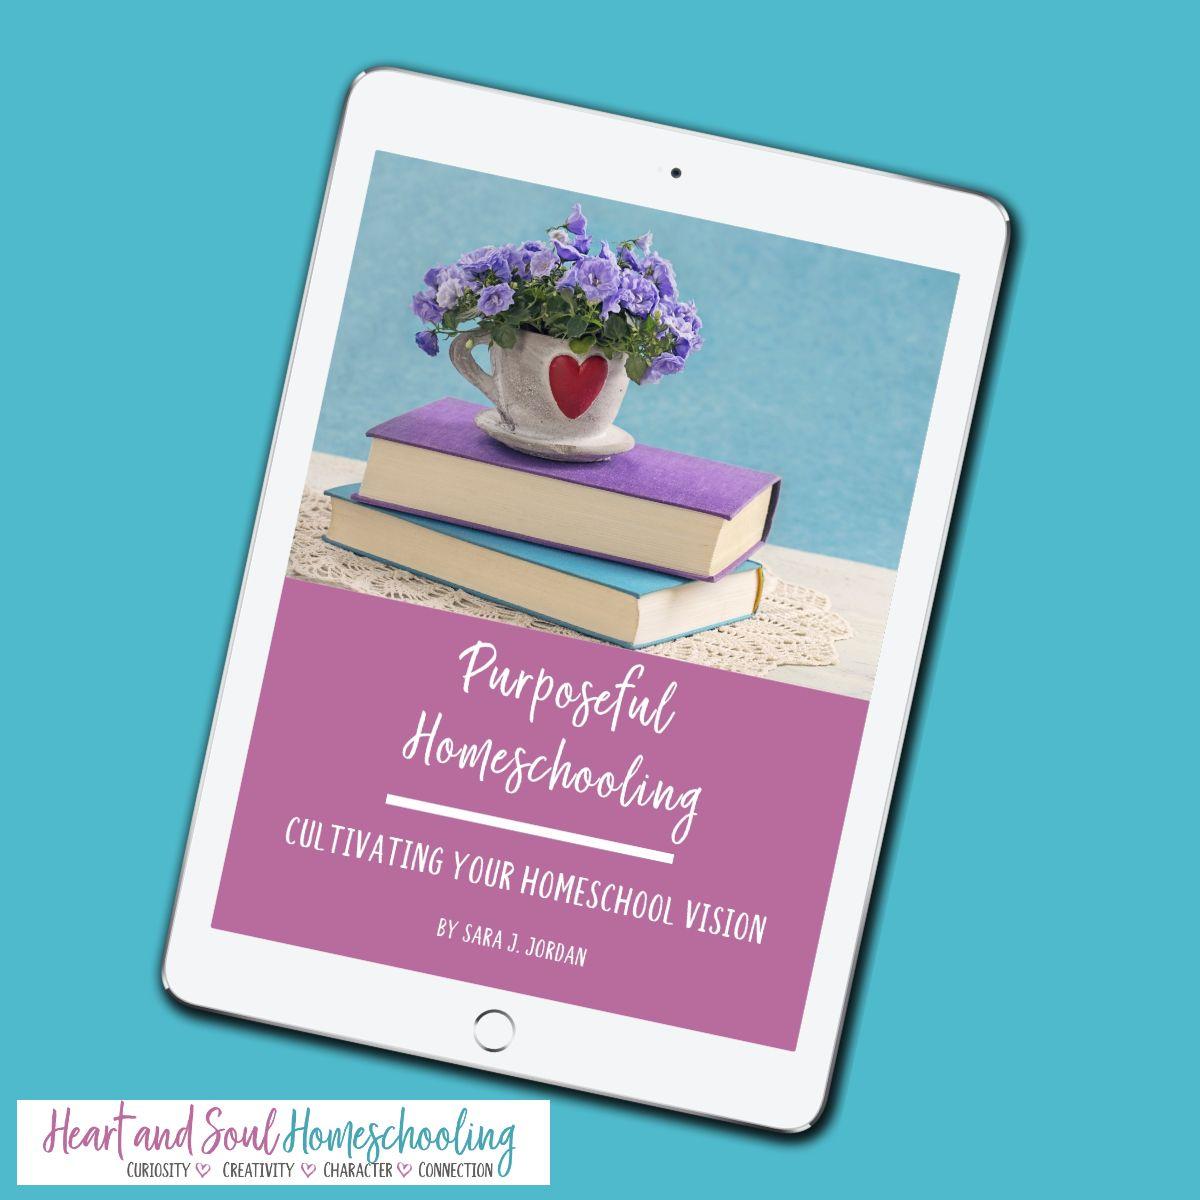 Purposeful Homeschooling: Cultivating Your Homeschool Vision (pdf workbook)